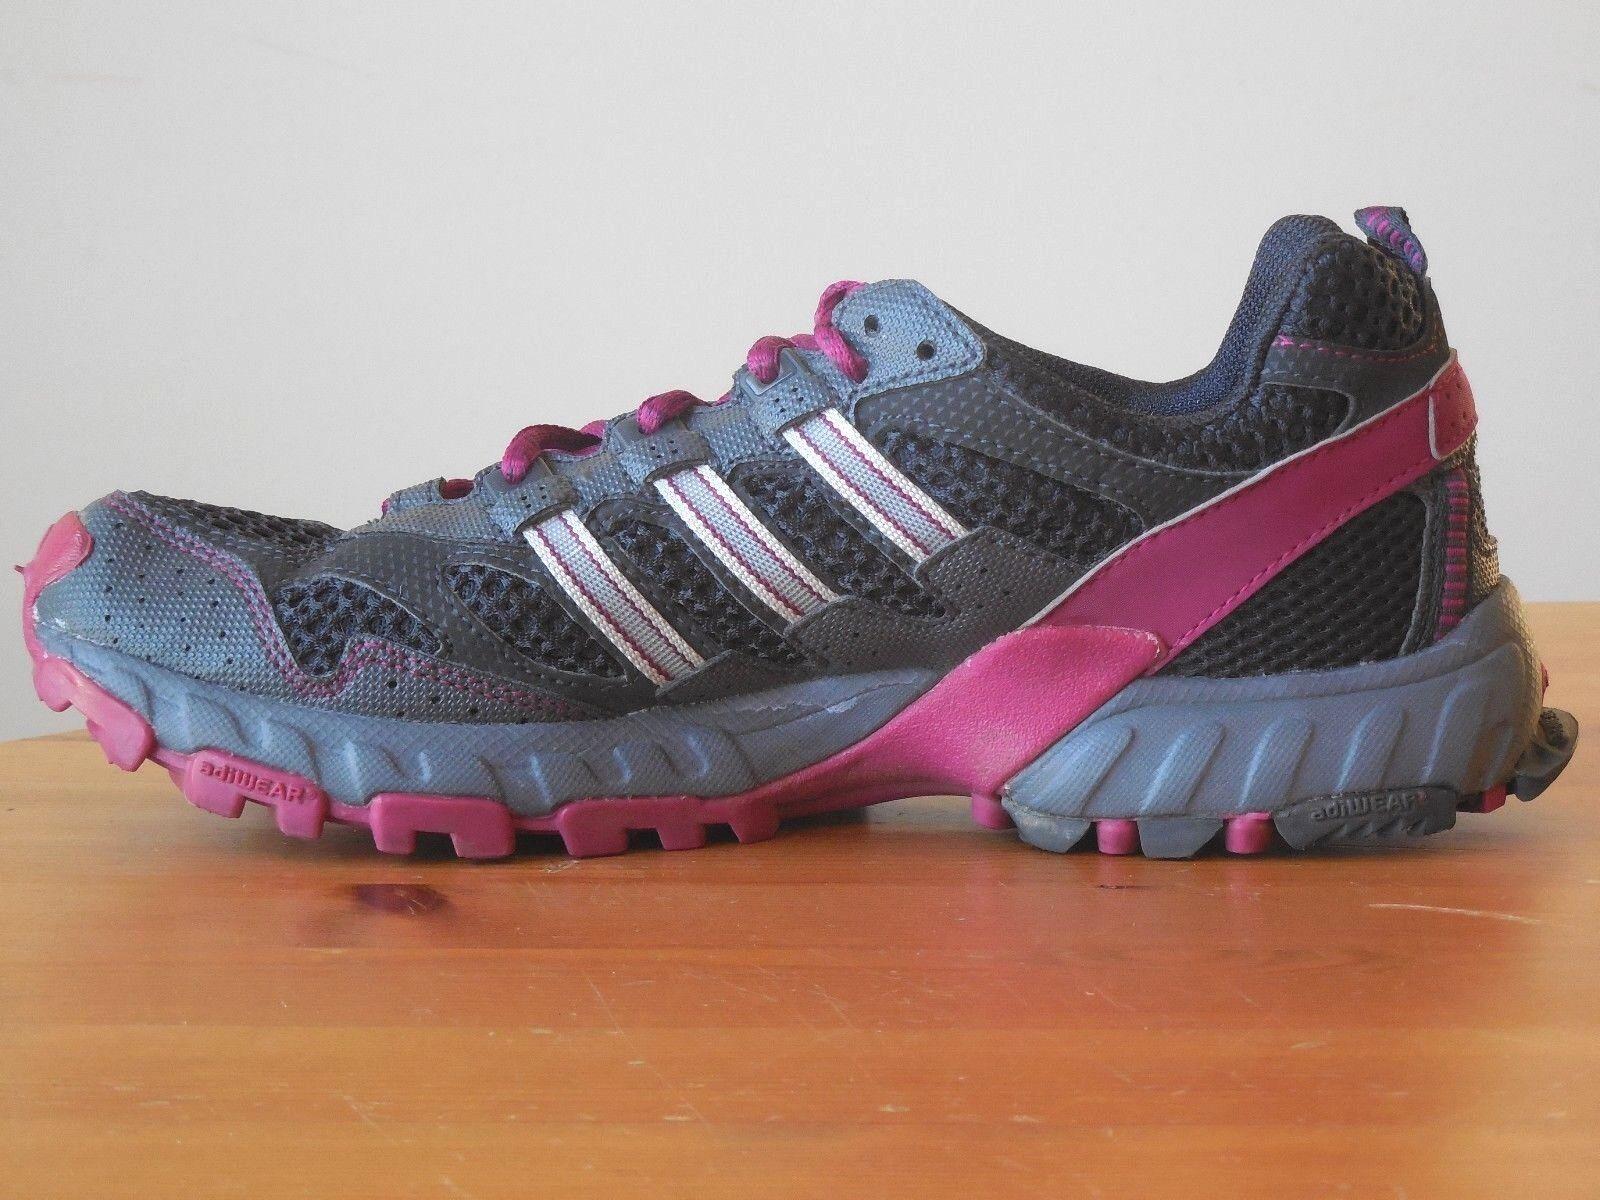 Adidas Kanadia TR Trail Running shoes Women's Size 8.5 G24817